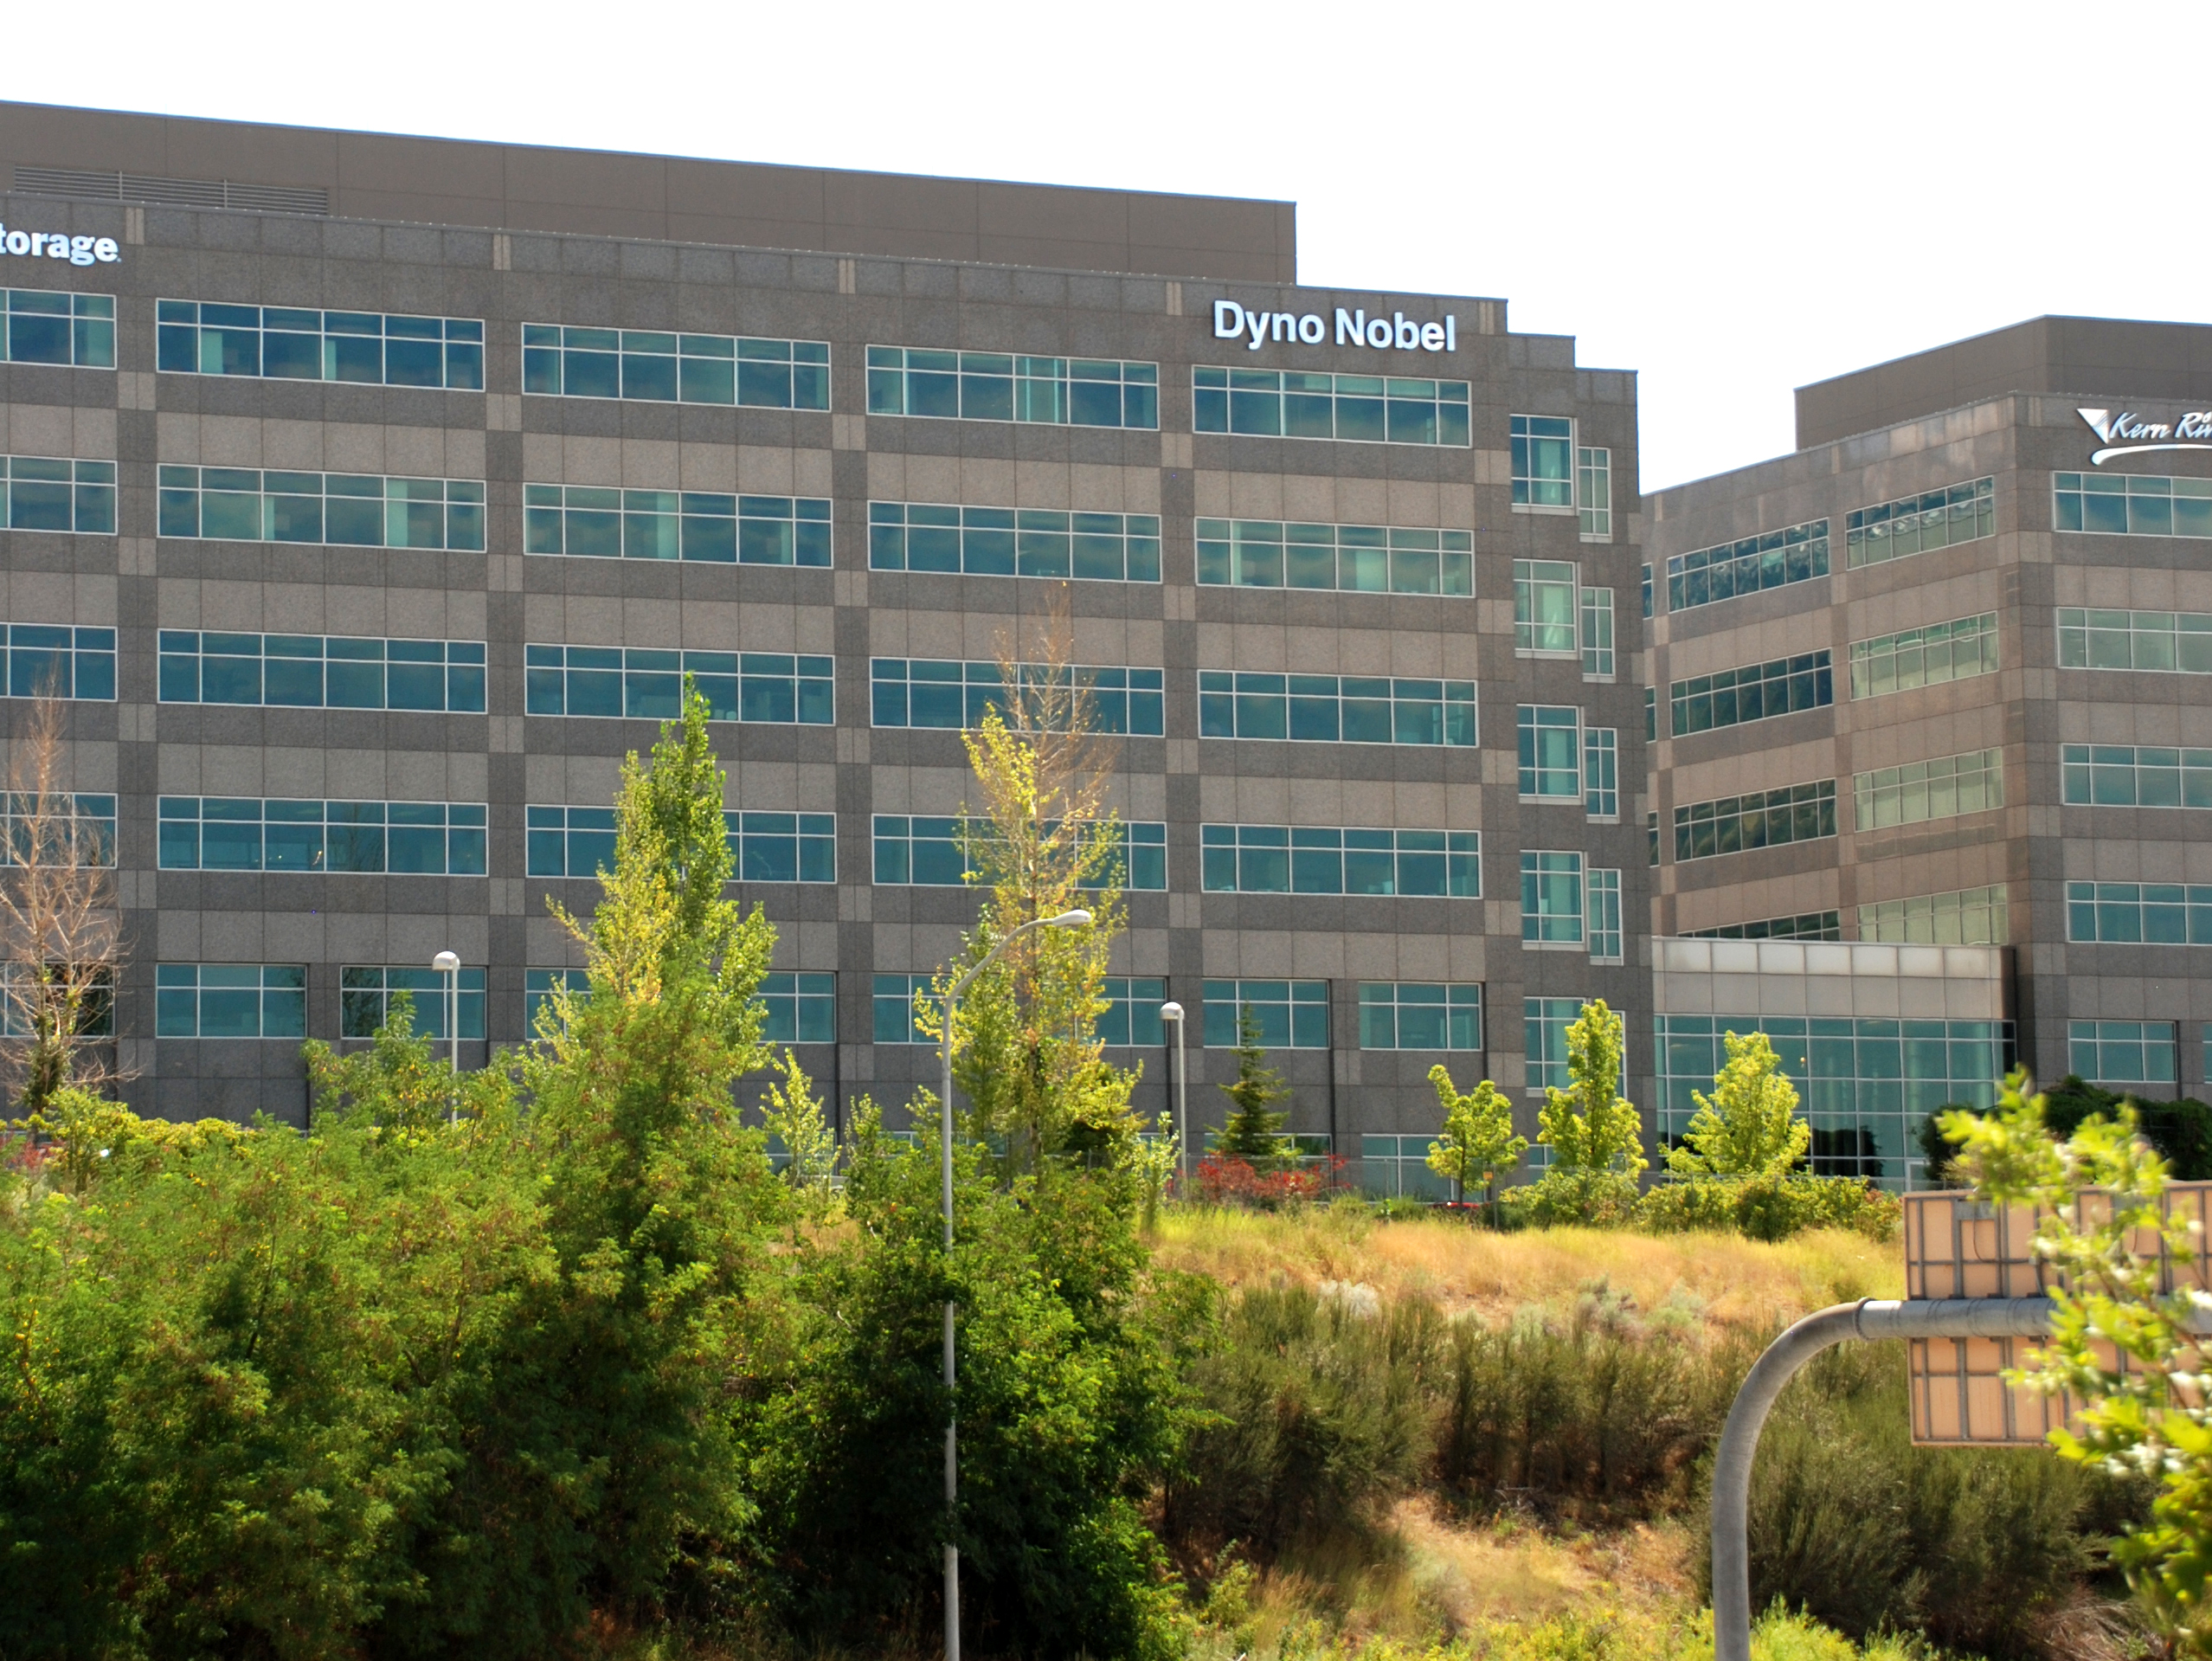 FileDyno Nobel Corporate Office In Salt Lake City UT USAjpg - Ut usa